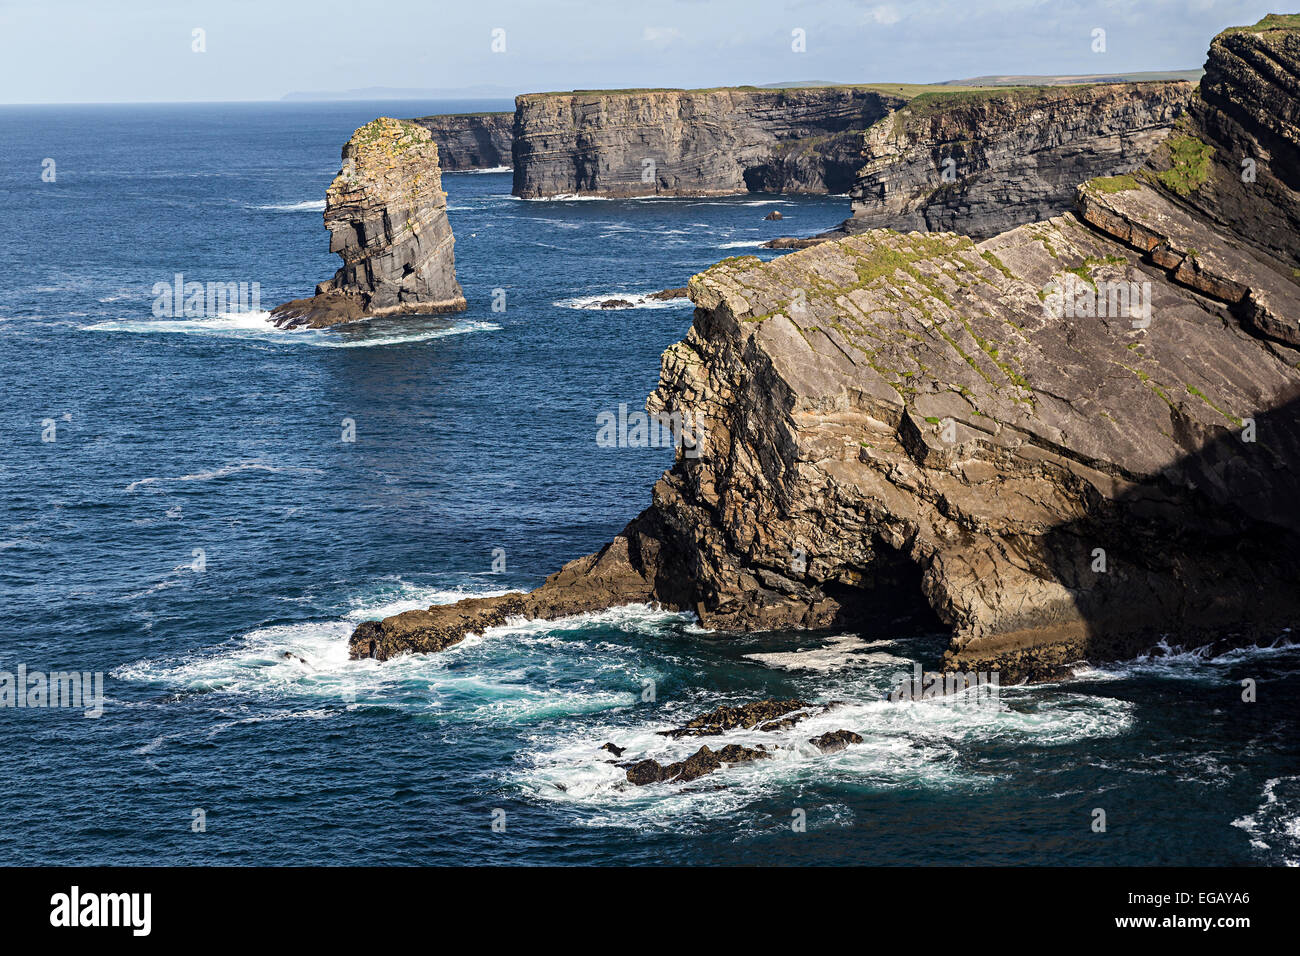 Sea stack on coastal scenic loop head, Co. Clare, west coast of Ireland - Stock Image